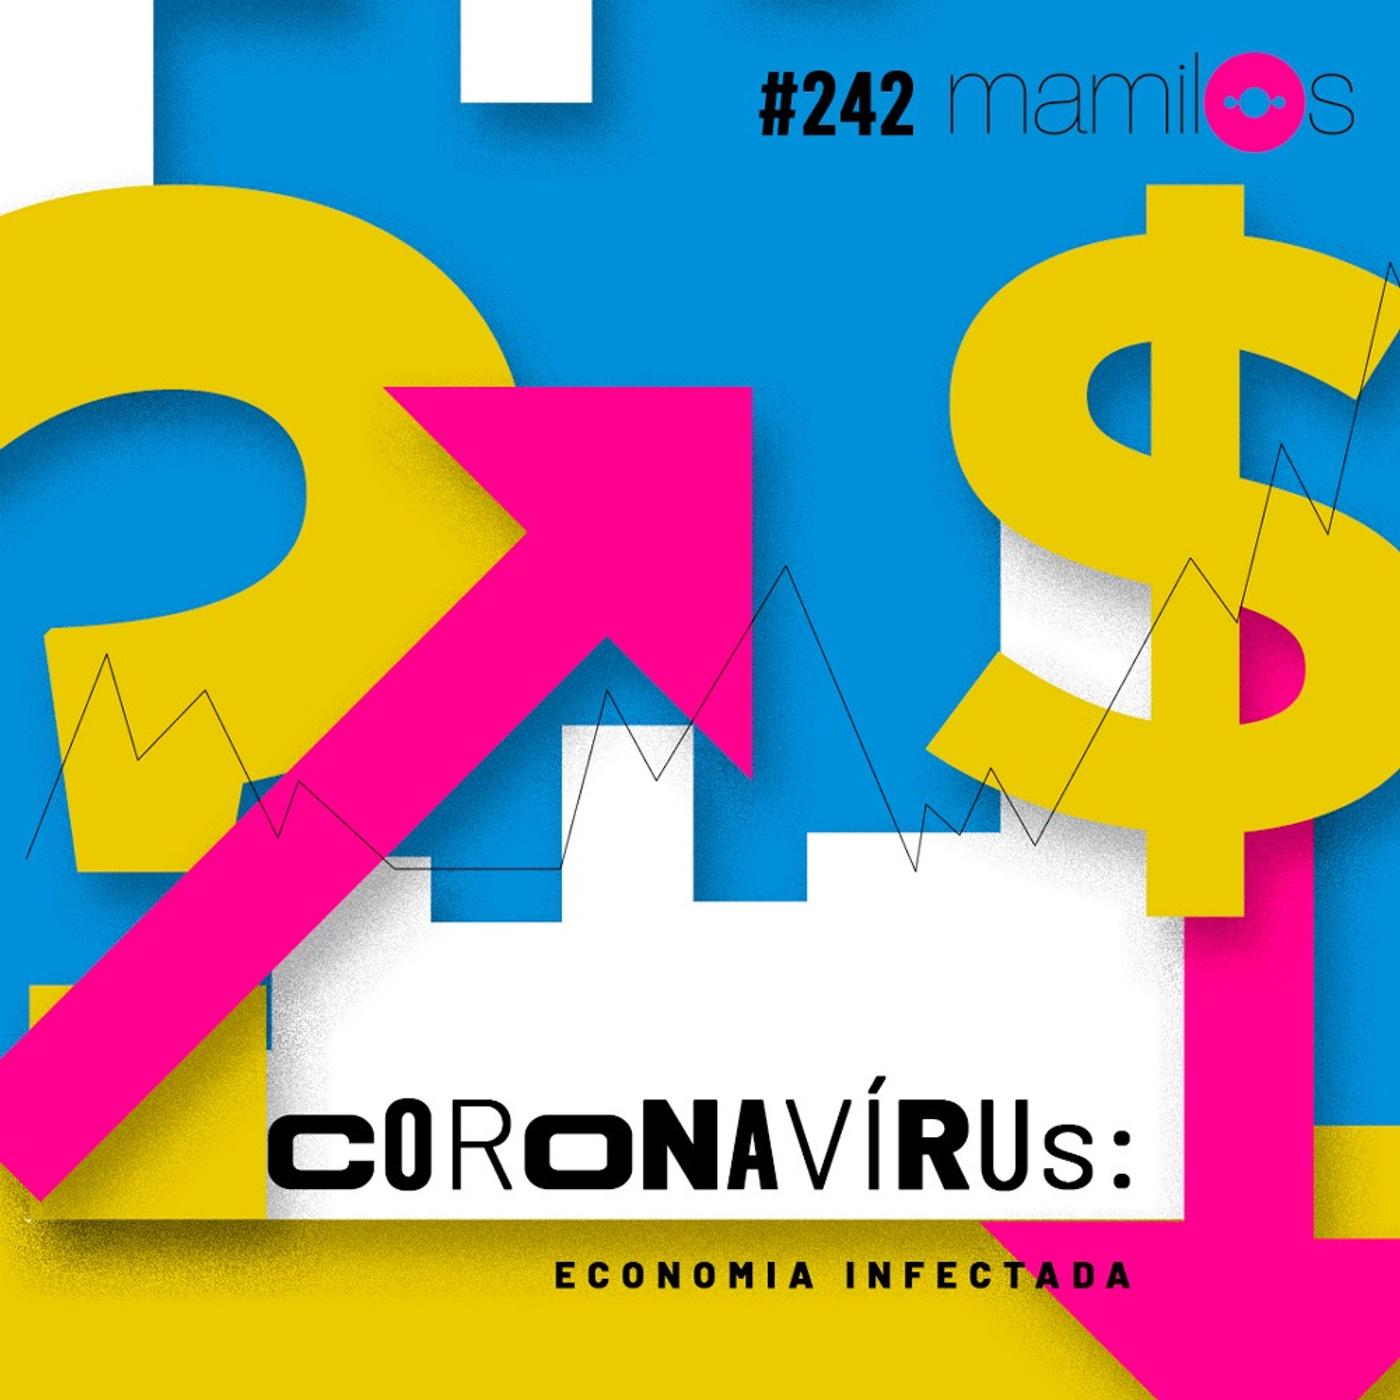 Coronavírus: economia infectada